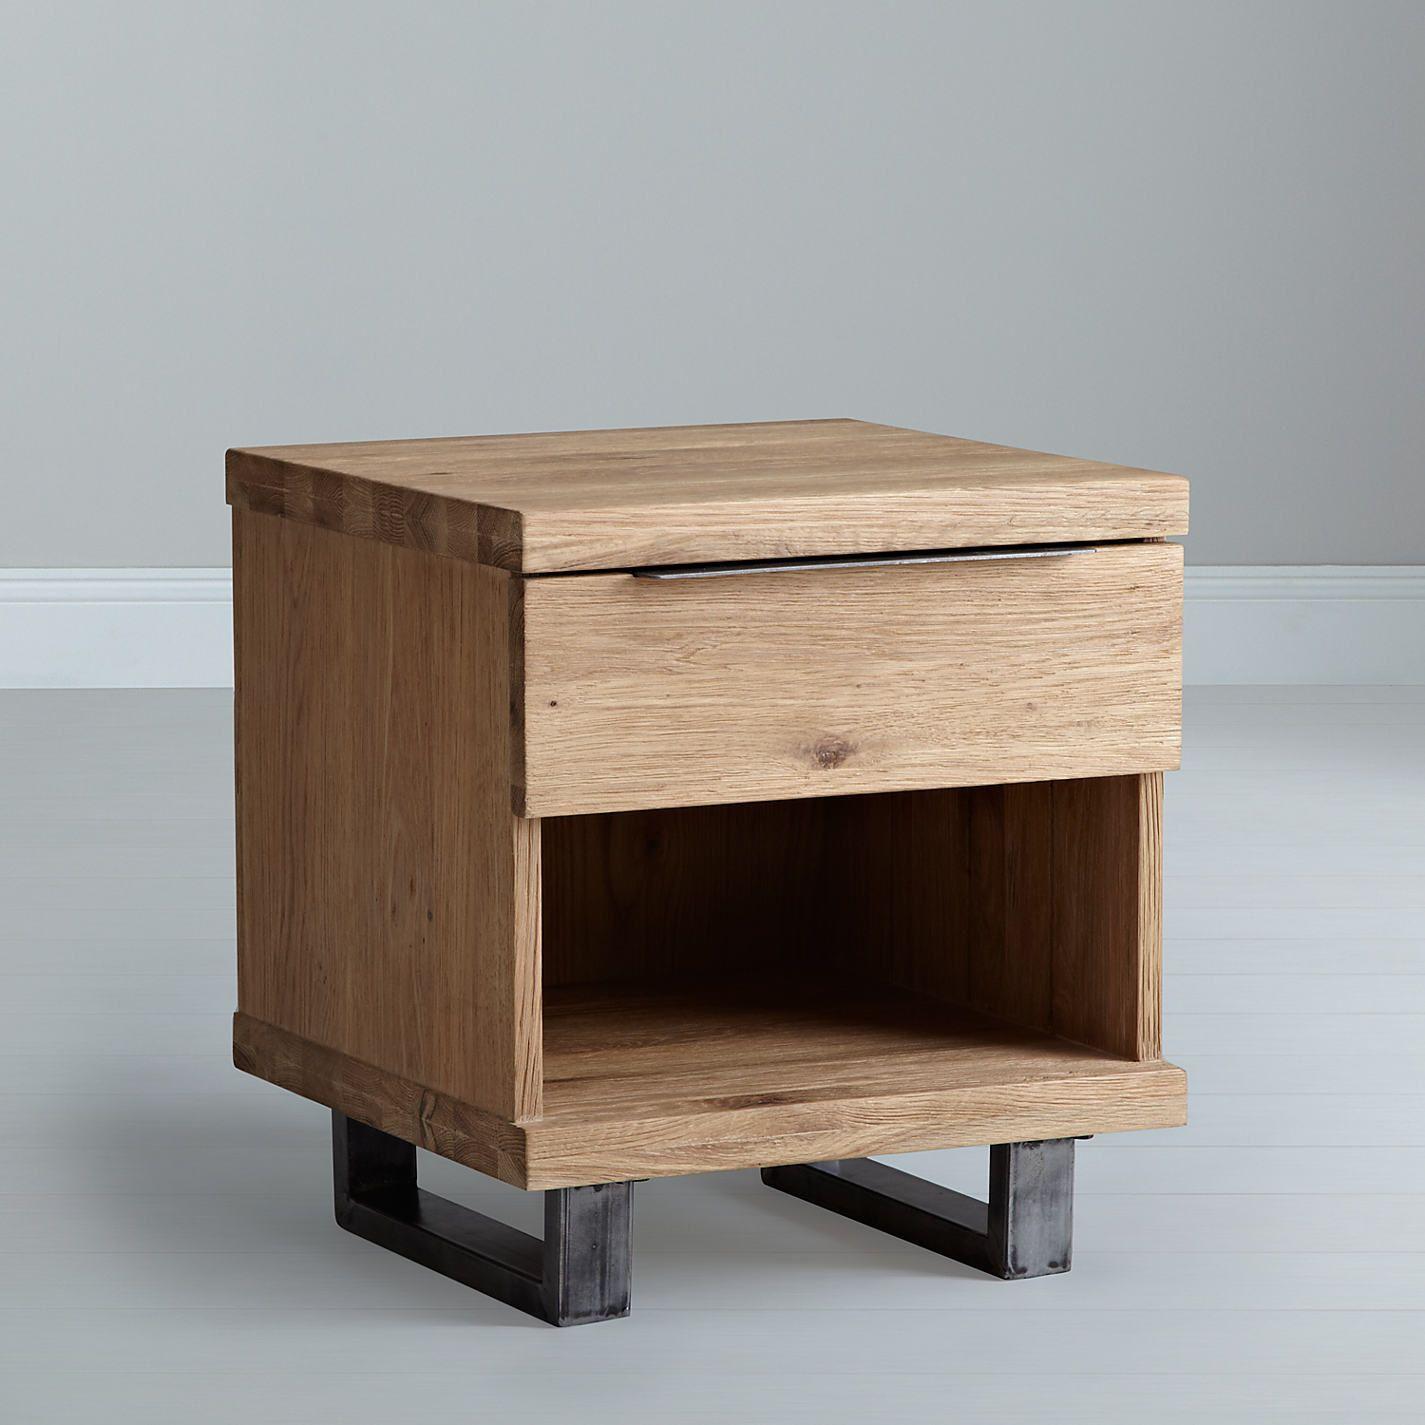 Buy John Lewis Calia Side Table online at John Lewis | Home | Pinterest